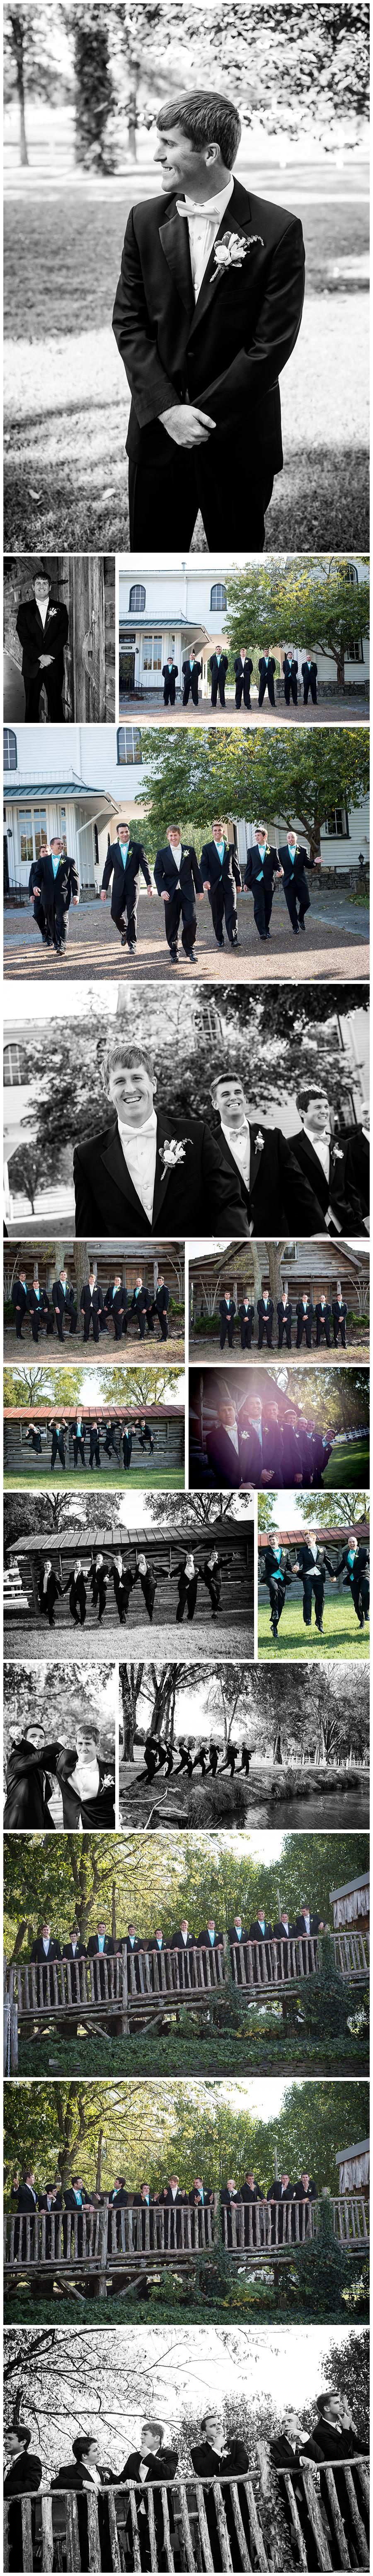 Matt-Blakely-Legacy-Farms-Wedding-Nashville-tn-tausha-ann-